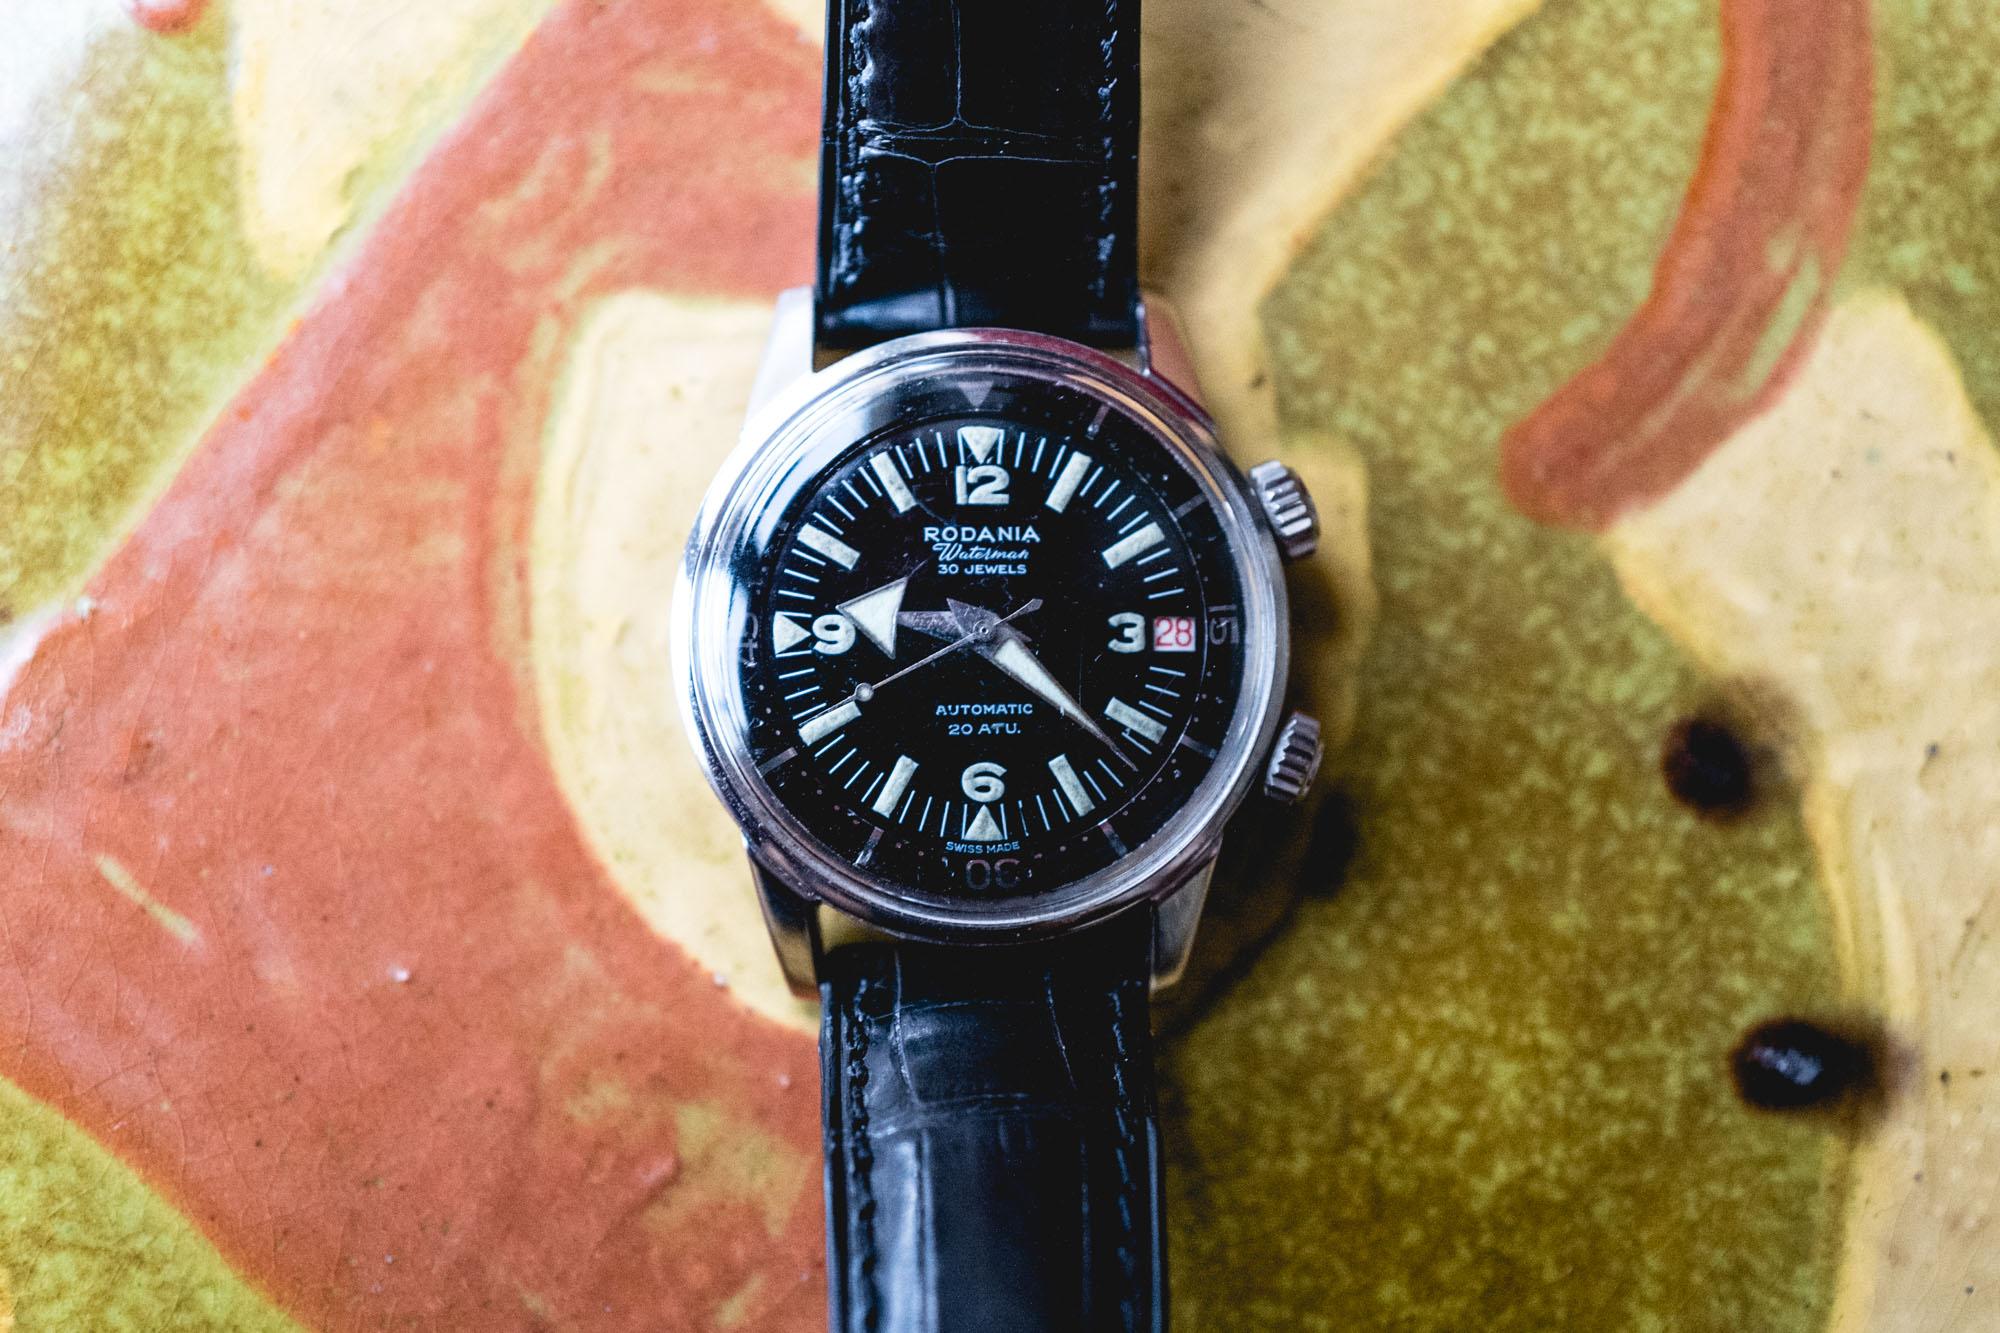 Tajan - Vente de montres du 11 décembre -Rodania Supercompressor